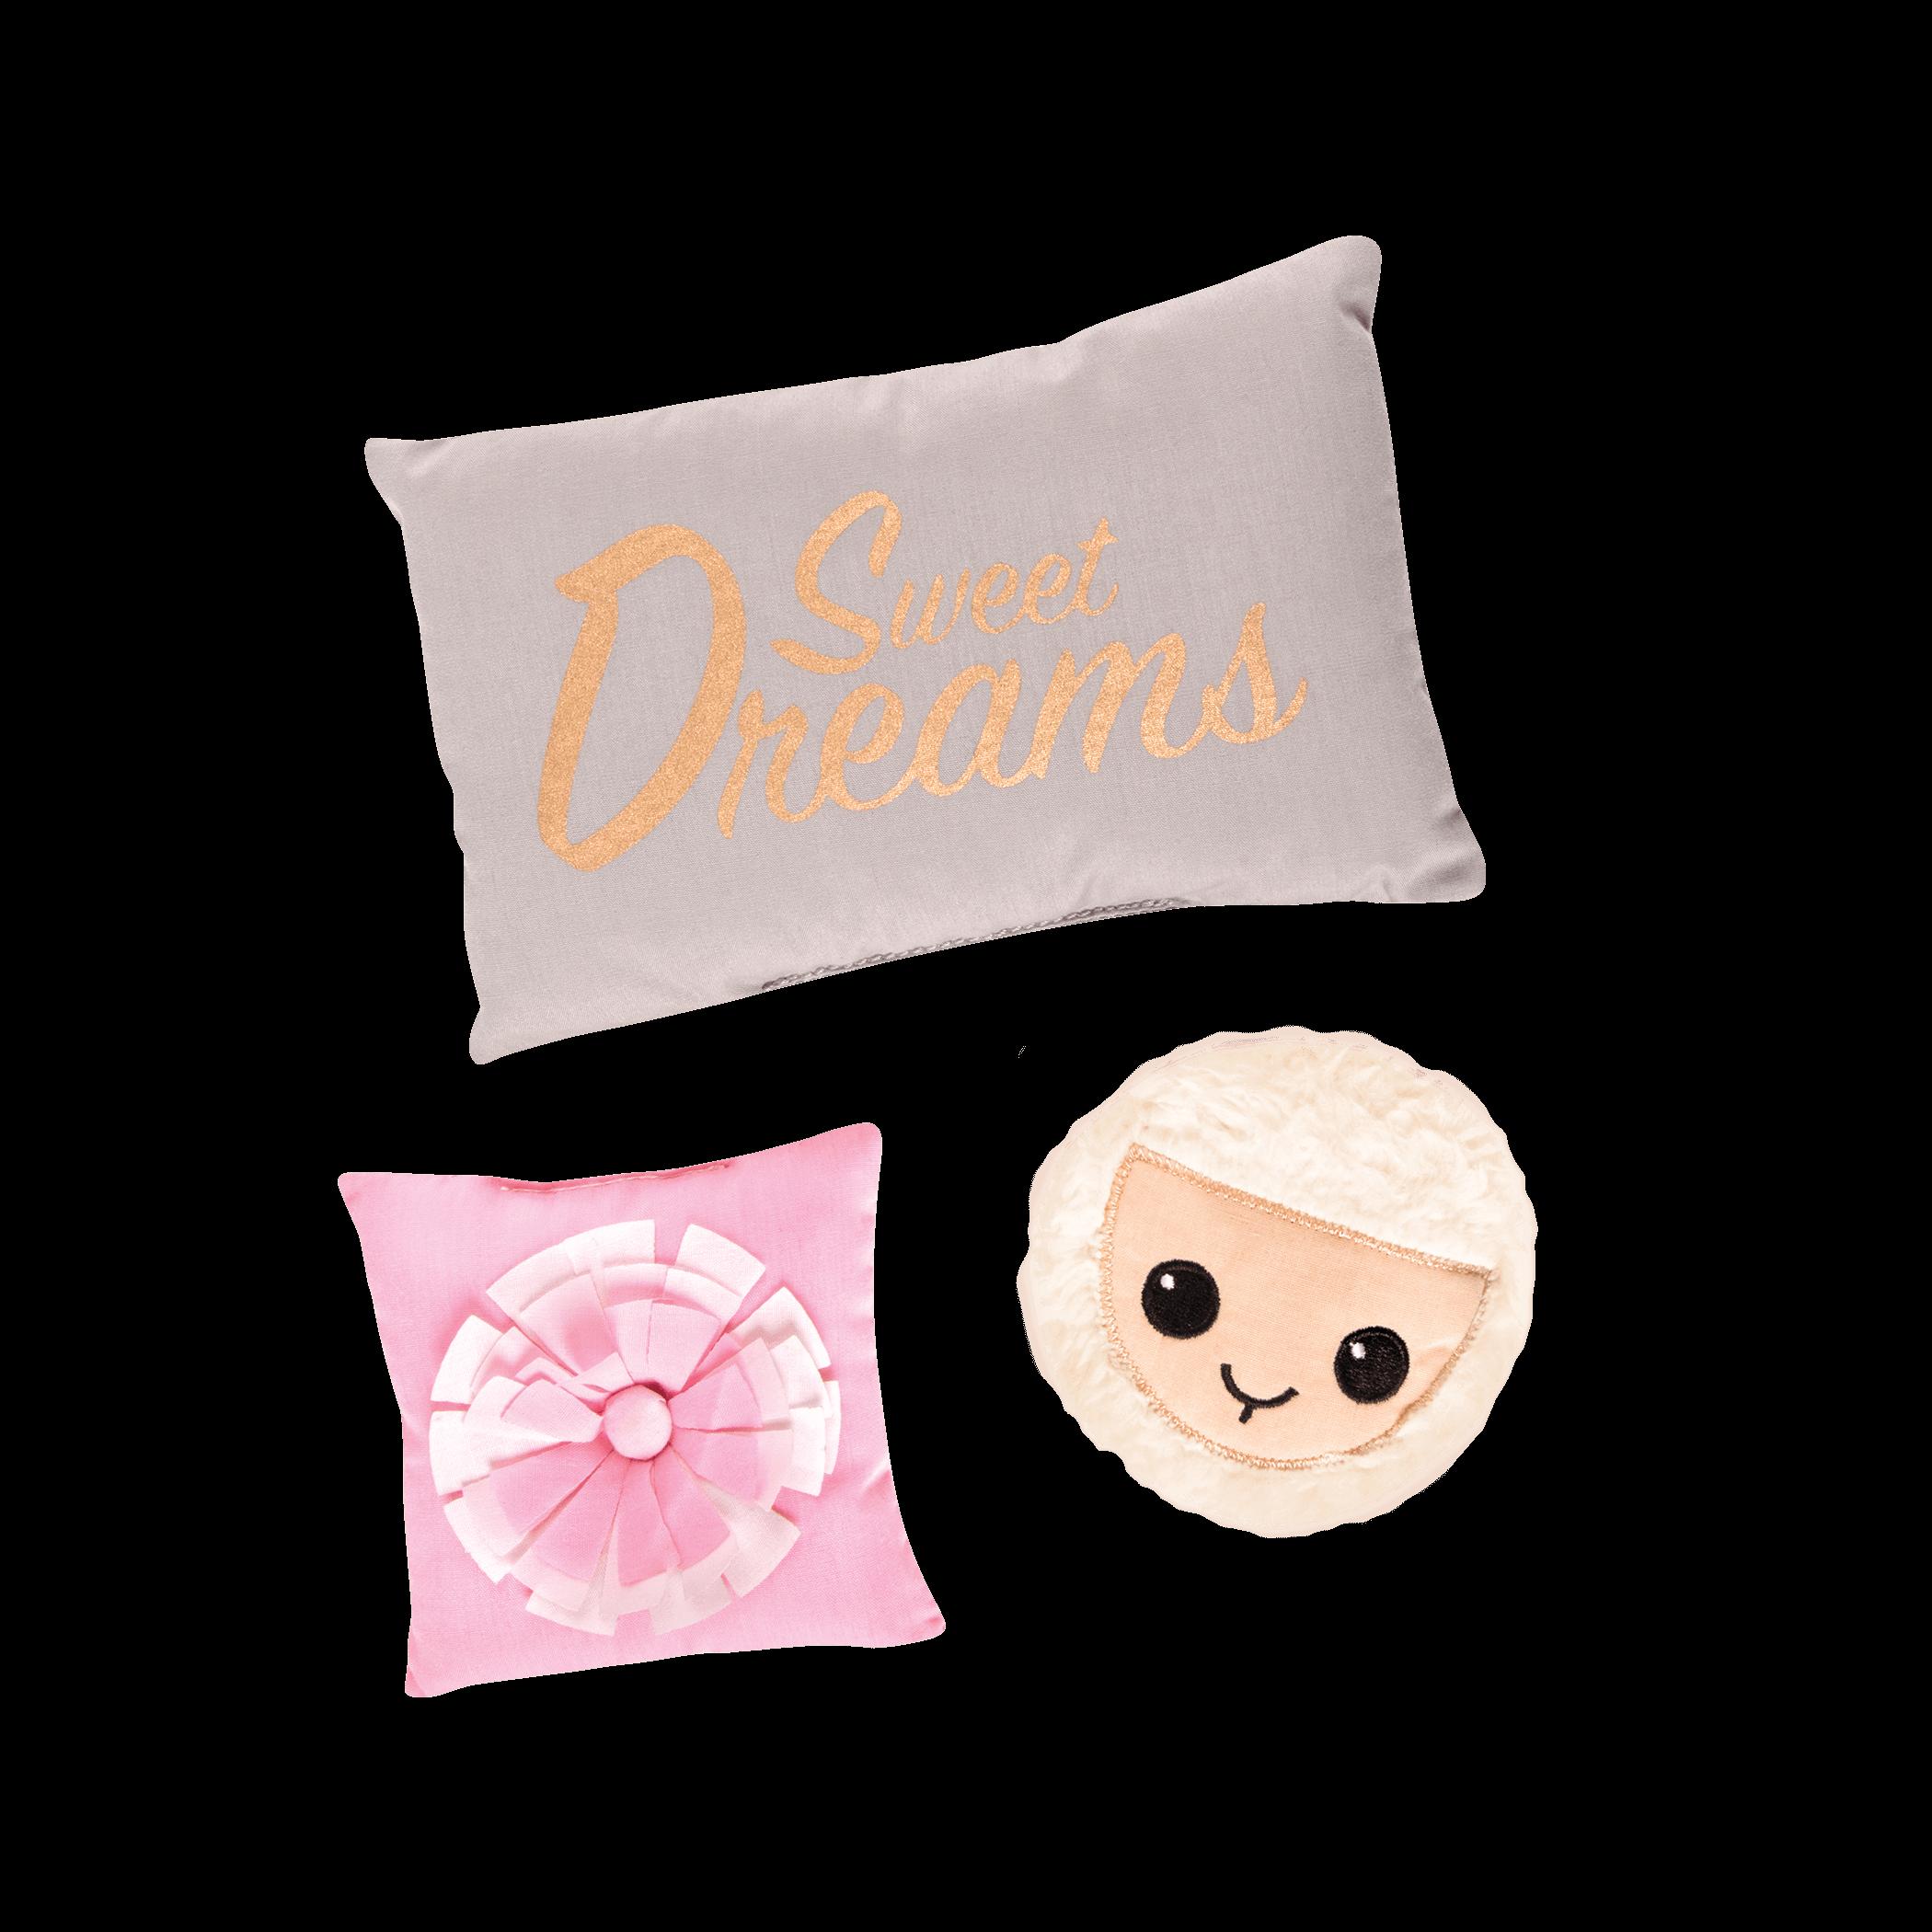 Details of accessories